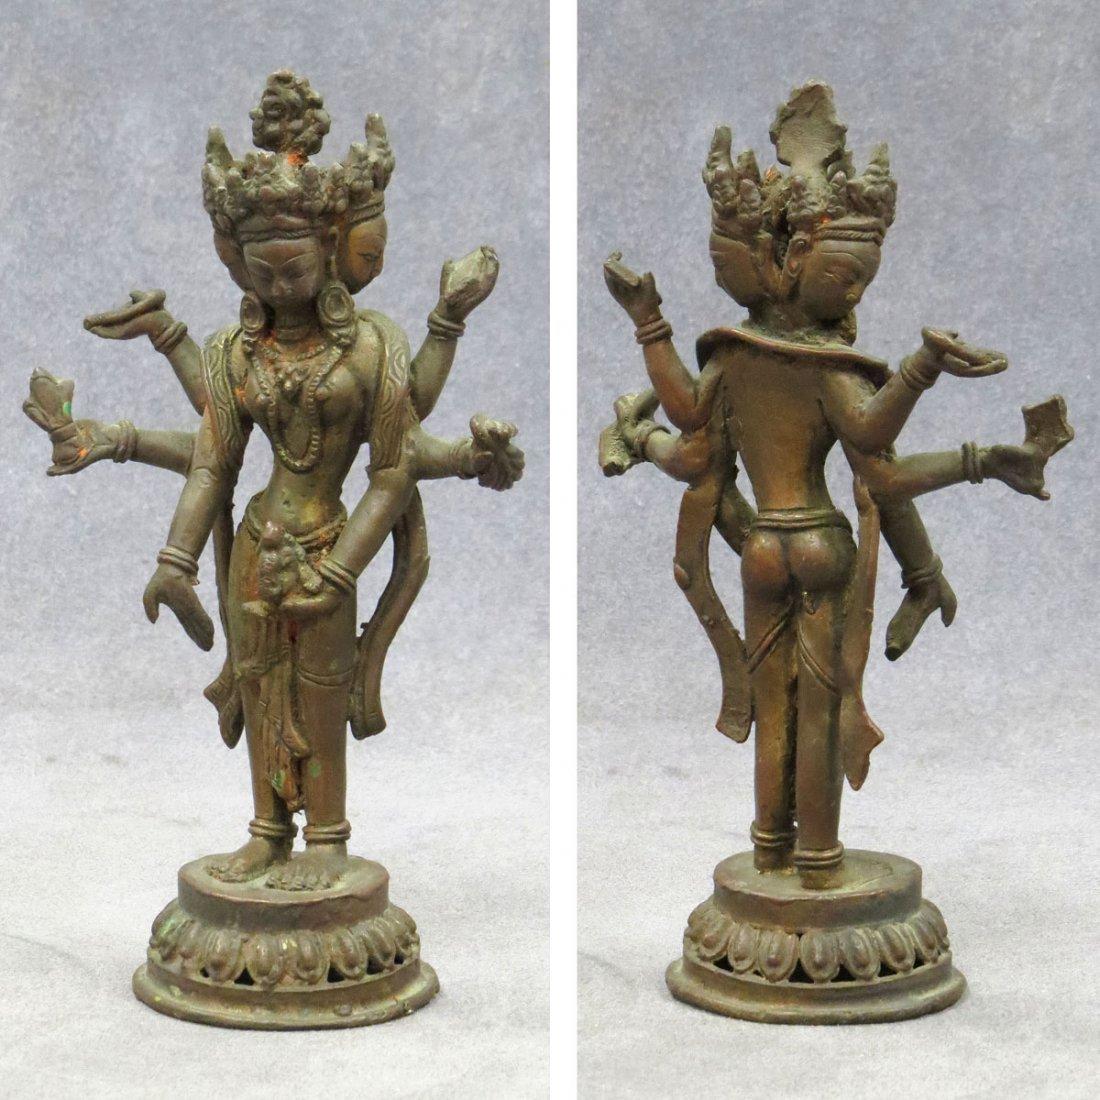 INDIAN BRONZE FIGURE OF SARASVATI